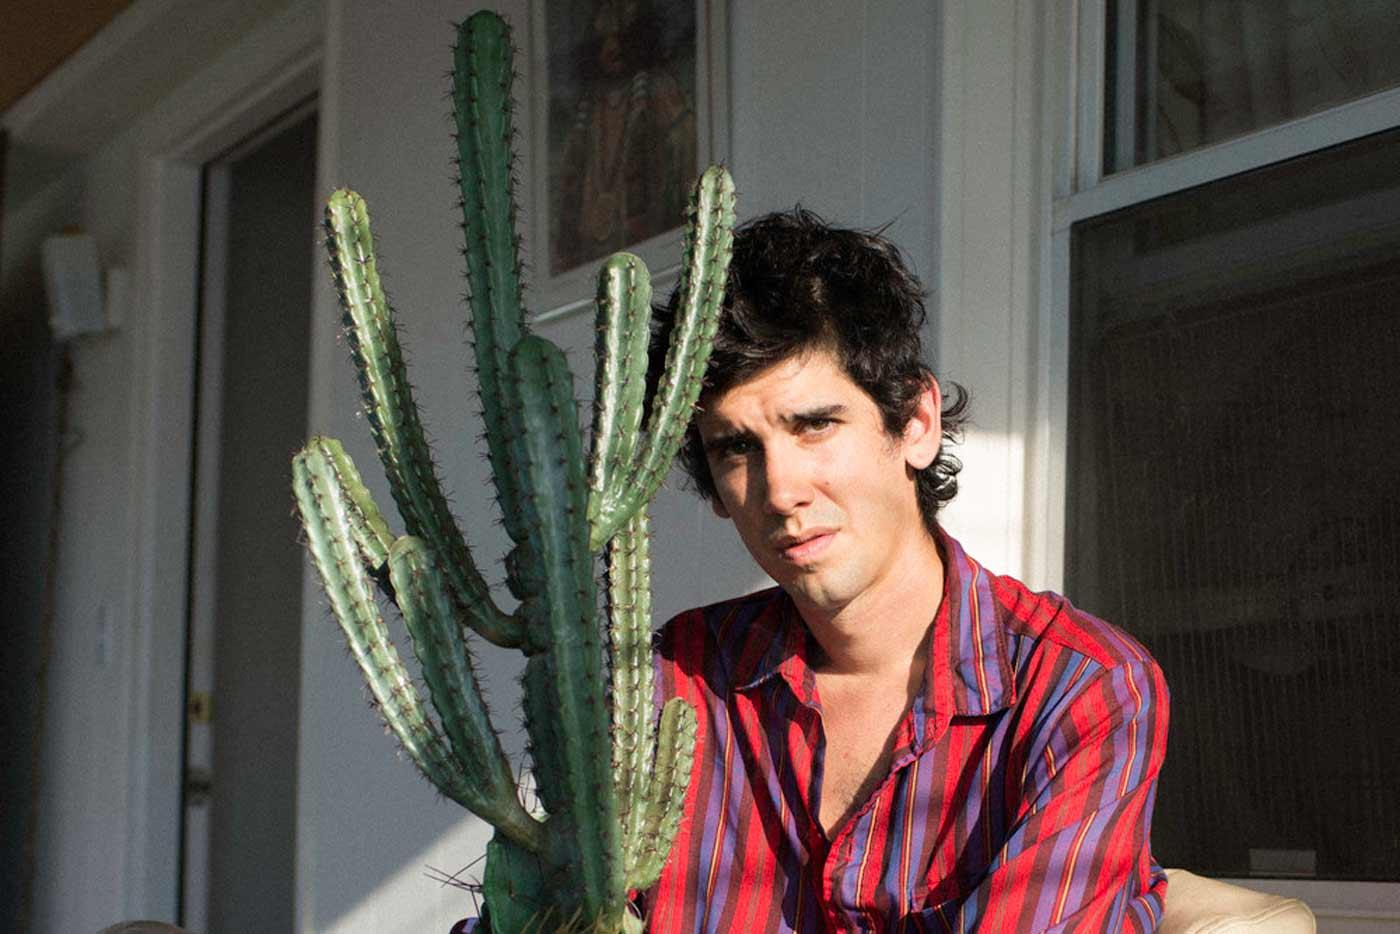 Tall Juan